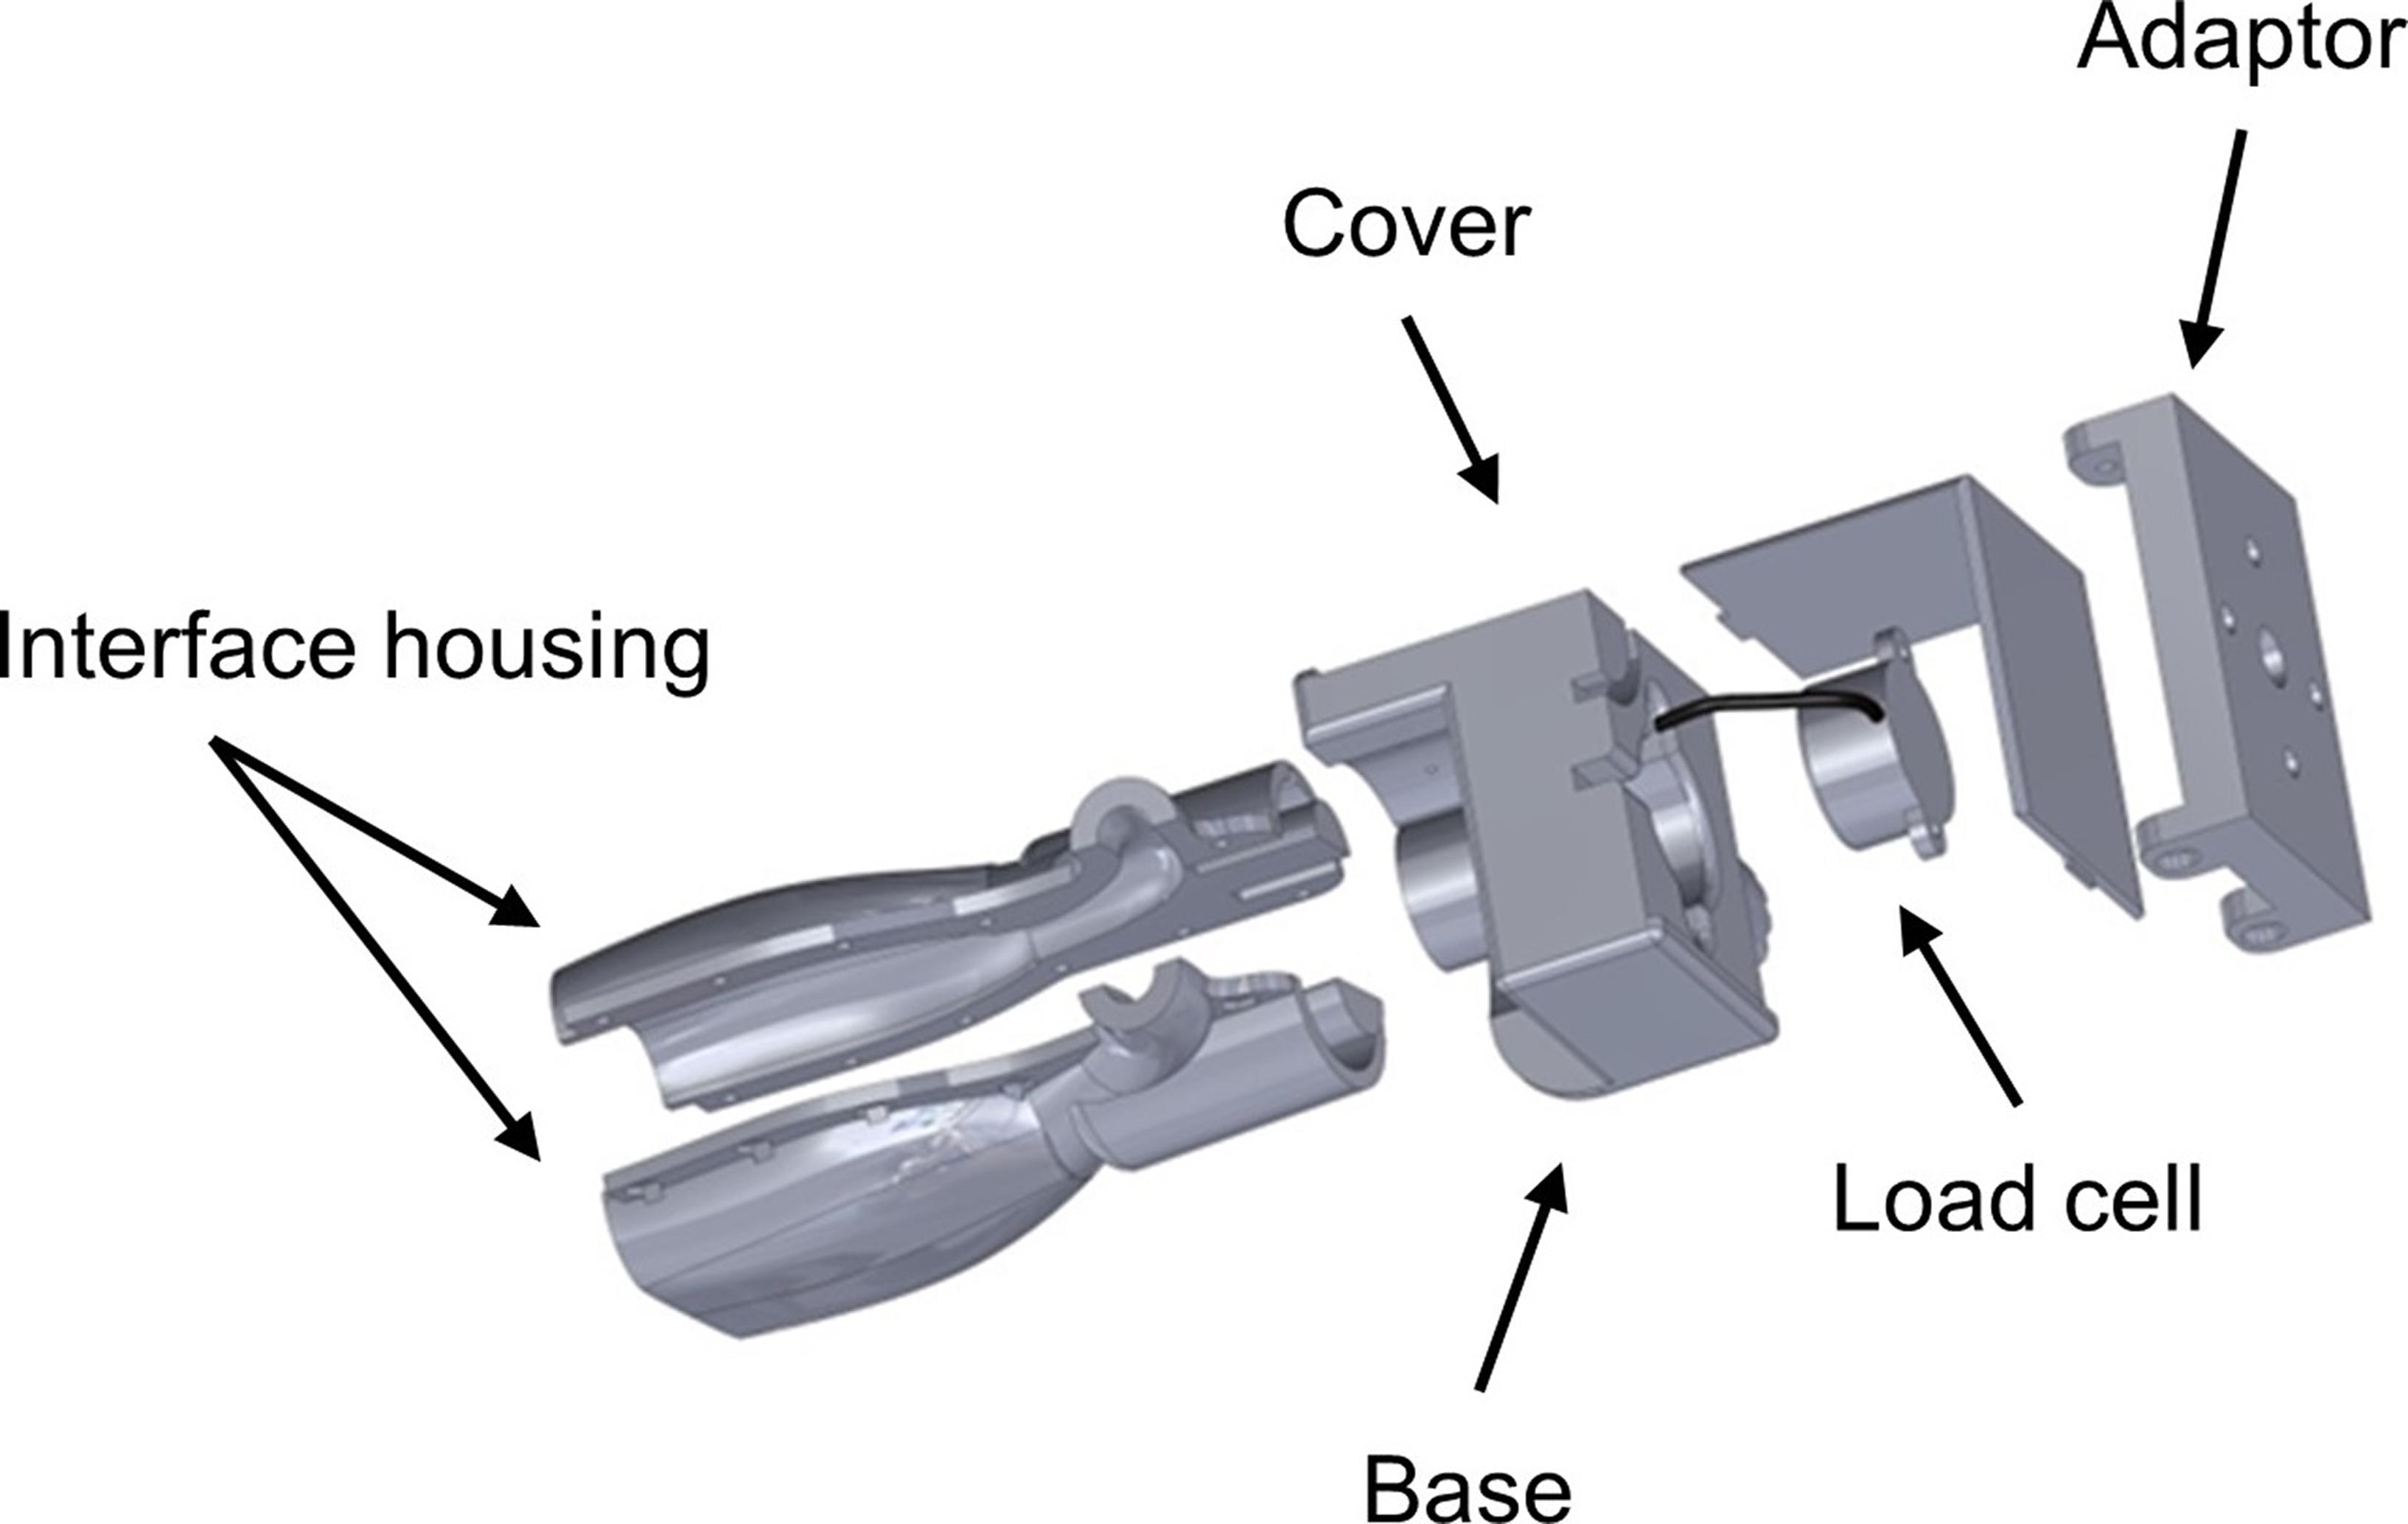 Interrater Reliability Of Quantitative Ultrasound Using